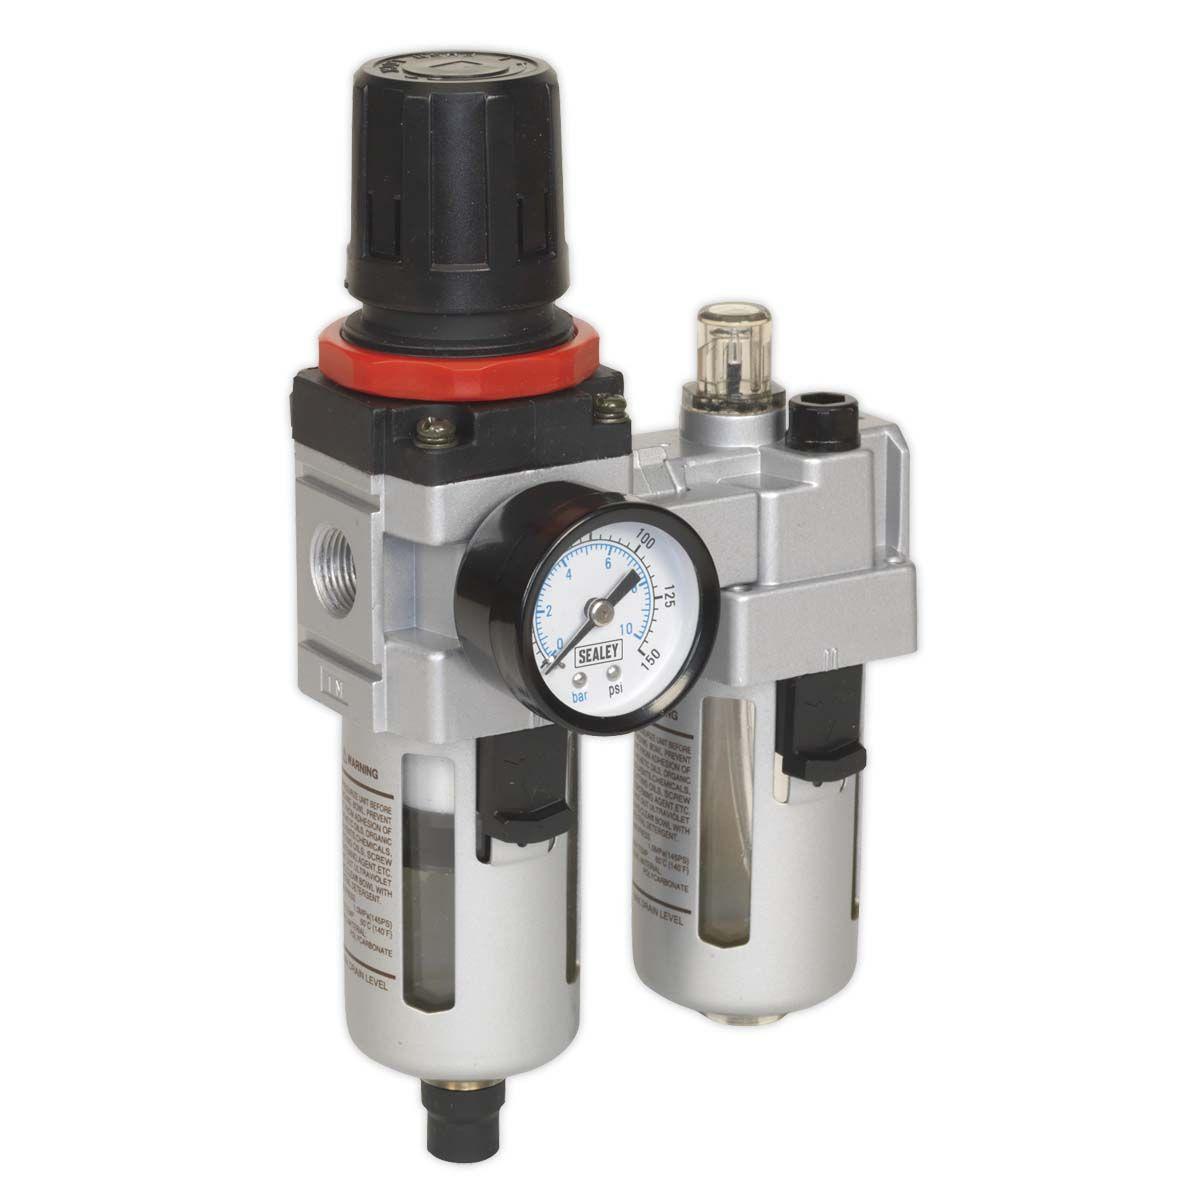 Sealey Air Filter/Regulator/Lubricator